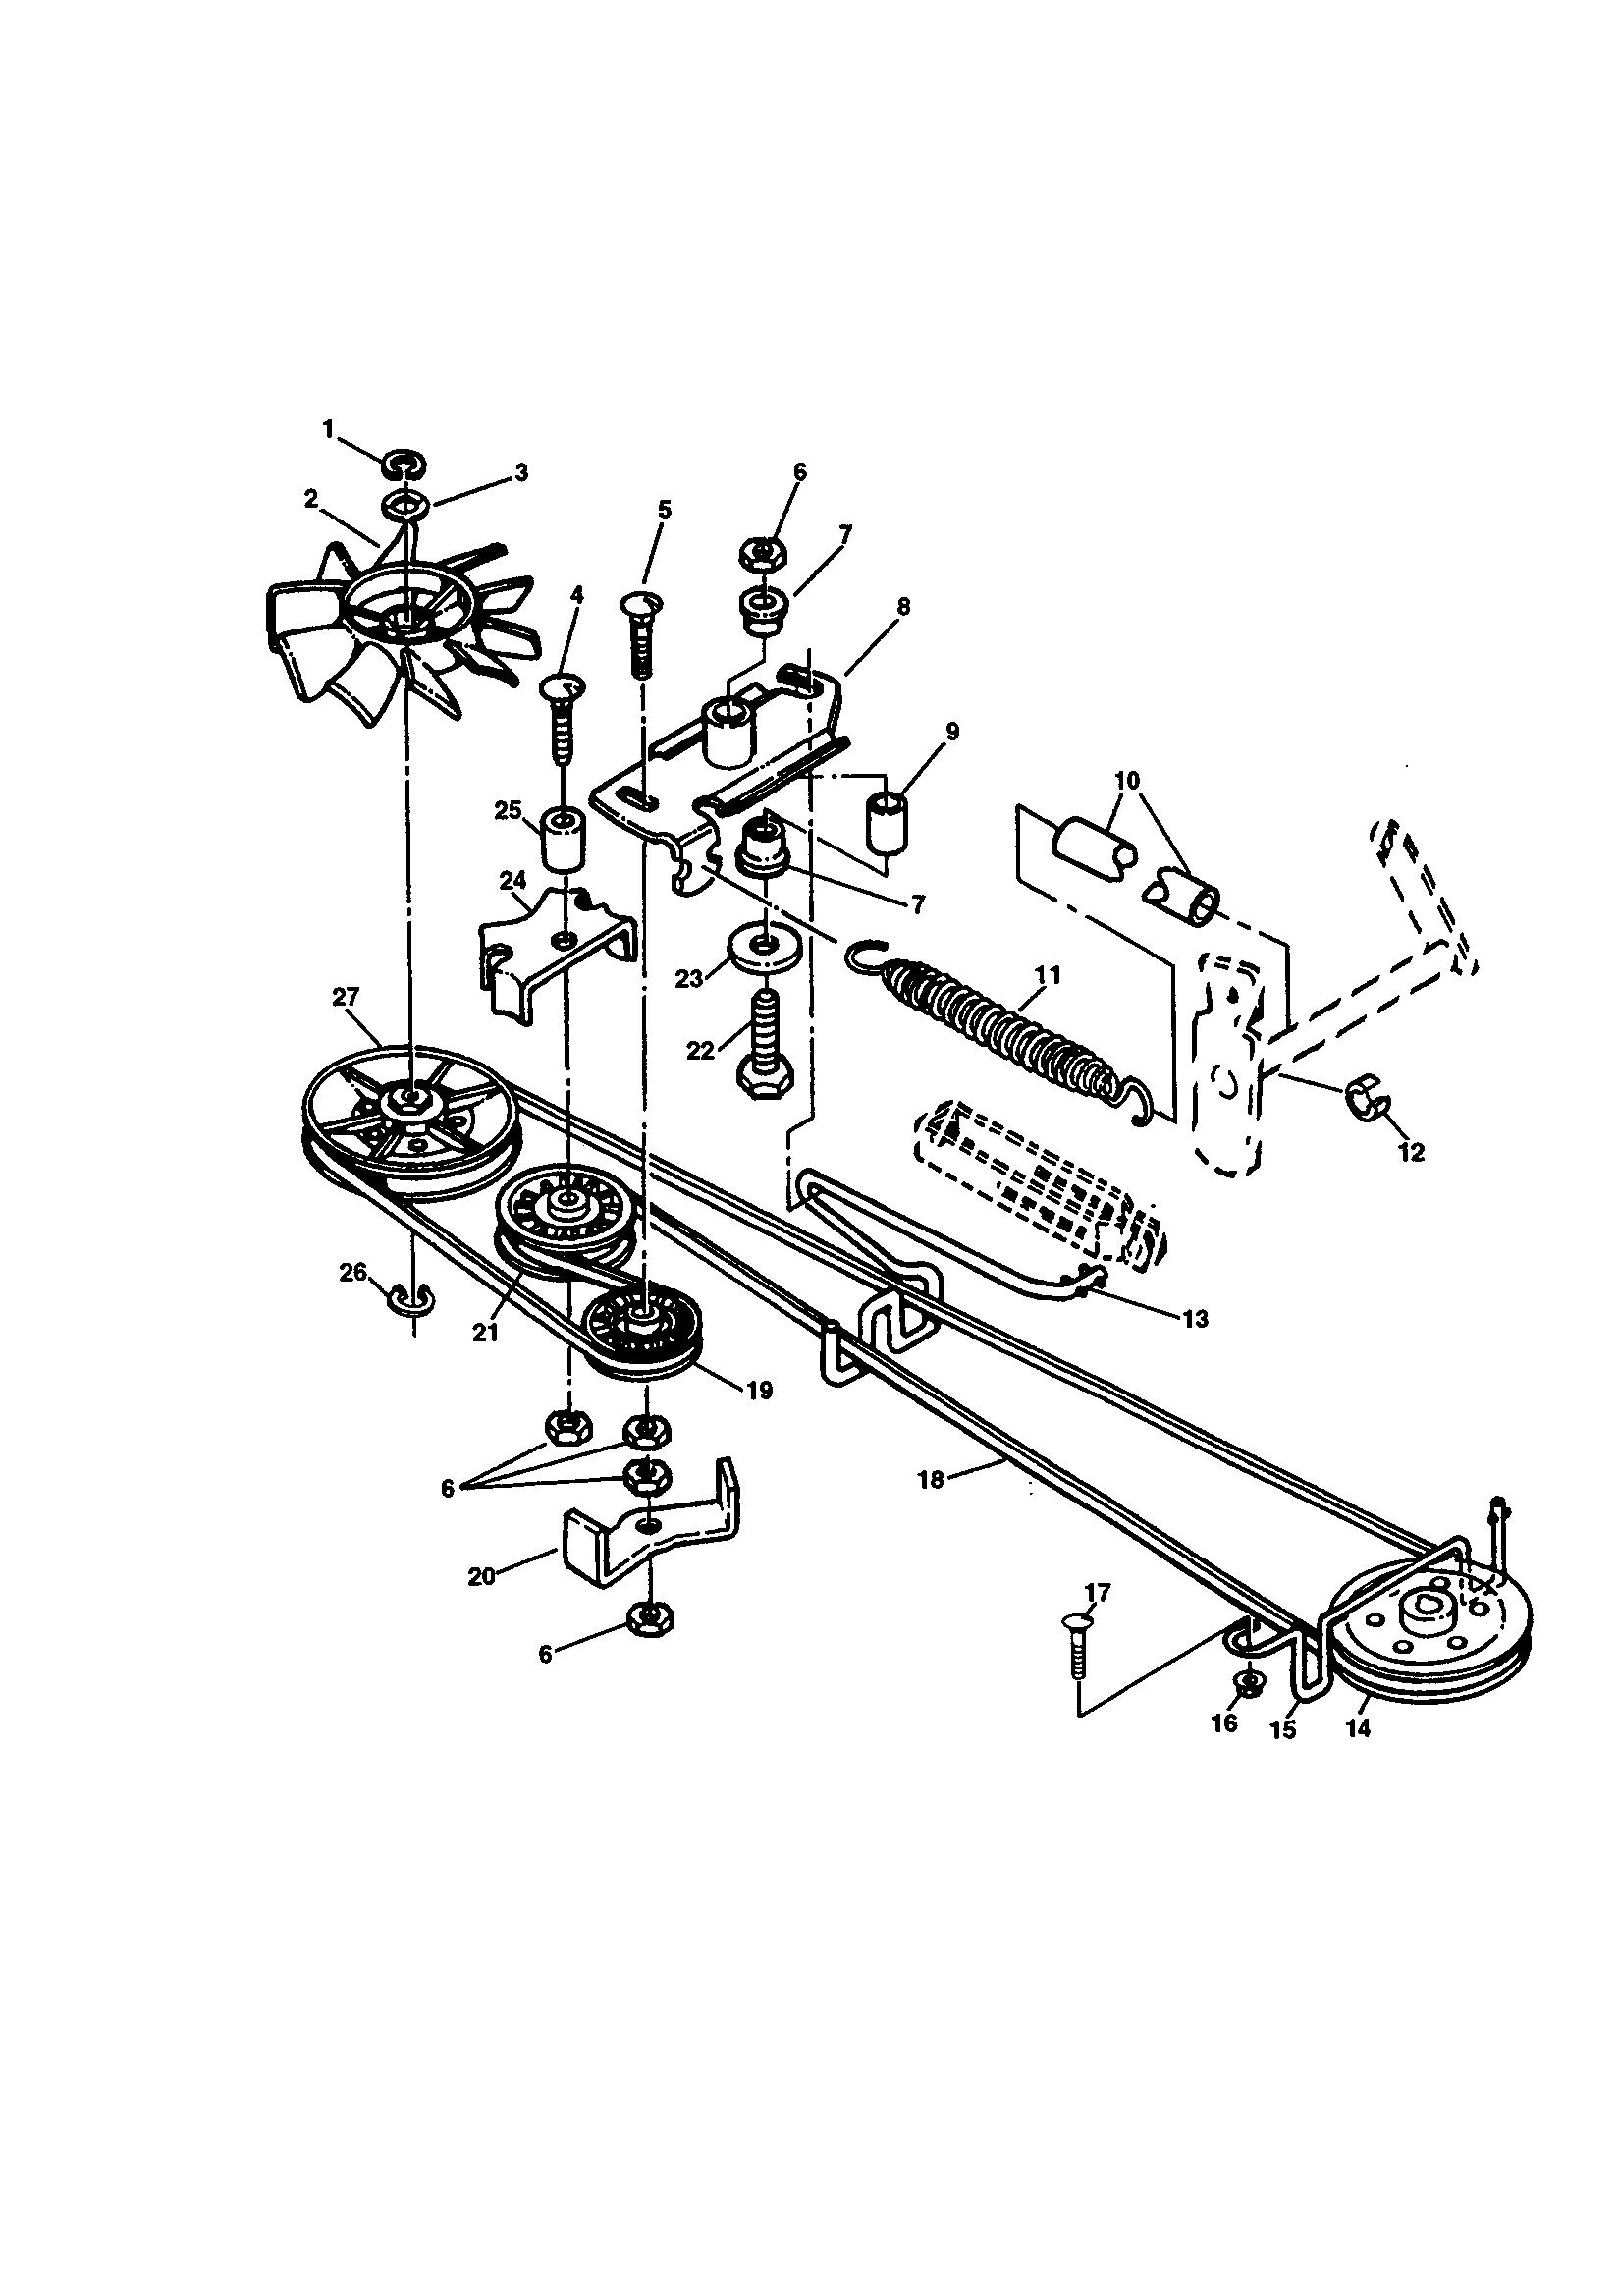 john deere sabre wiring diagram 2005 dodge durango infinity stereo mower deck